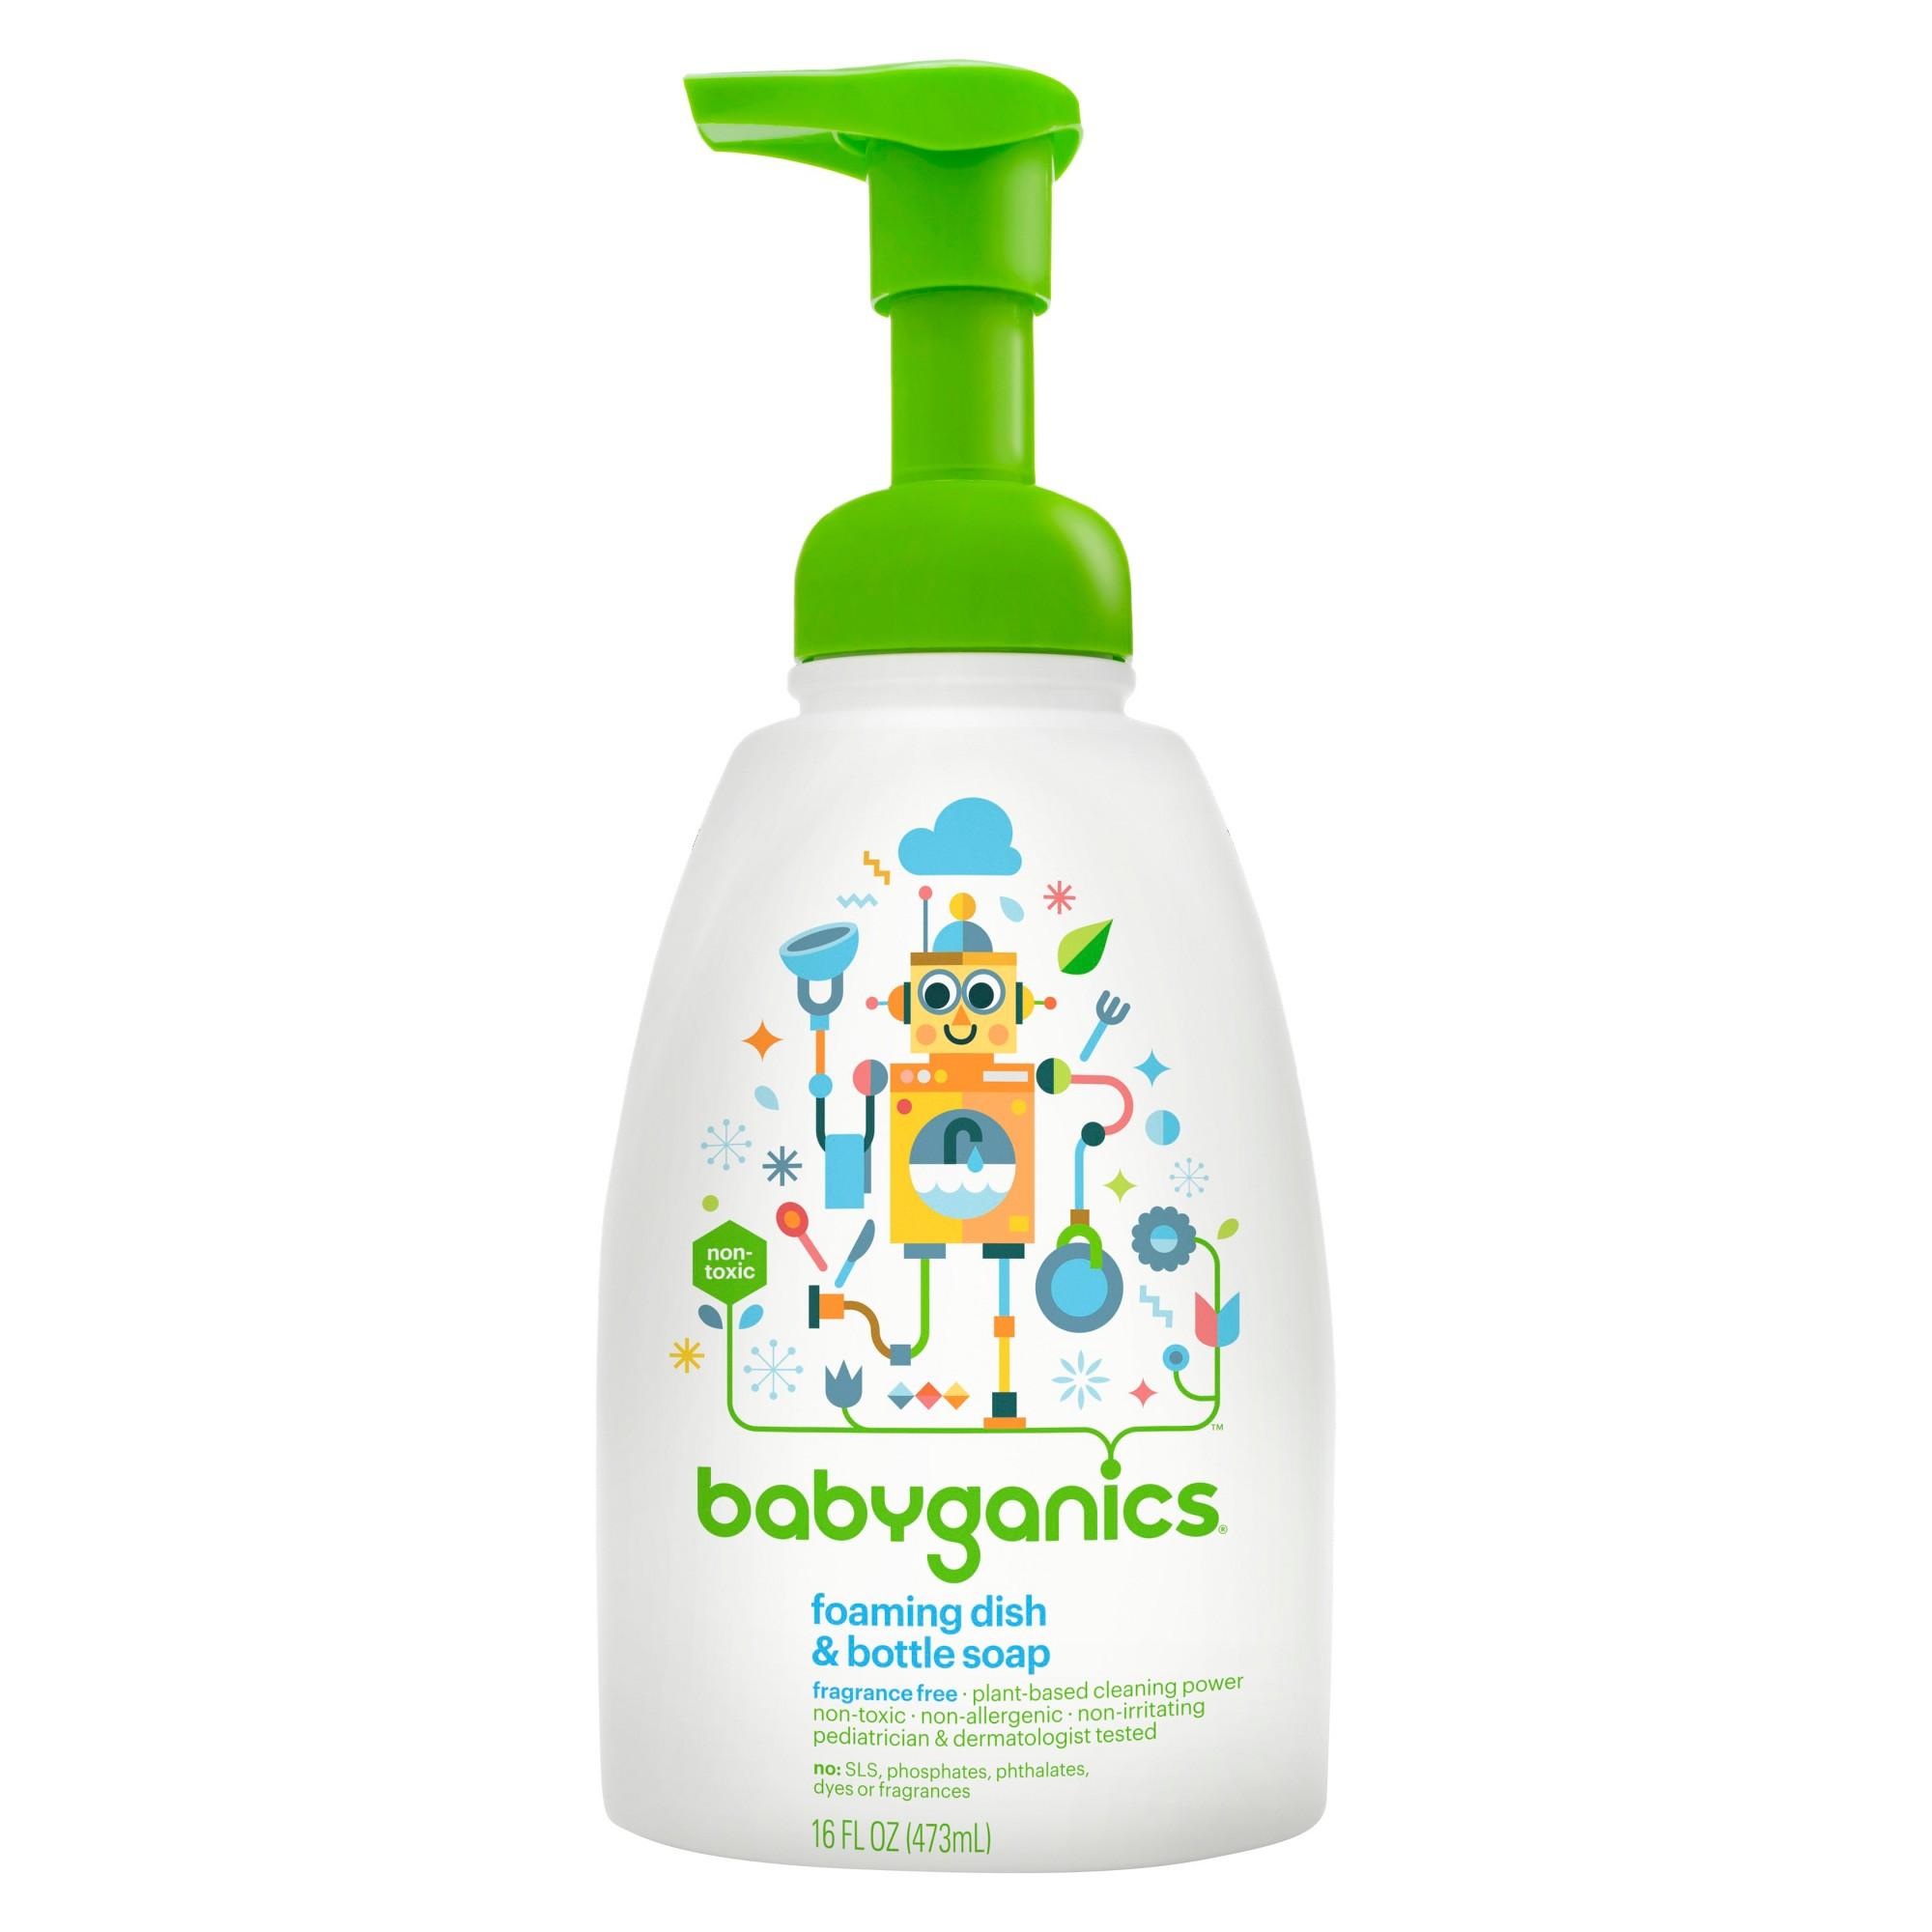 Babyganics Foaming Dish Bottle Soap Fragrance Free 16oz